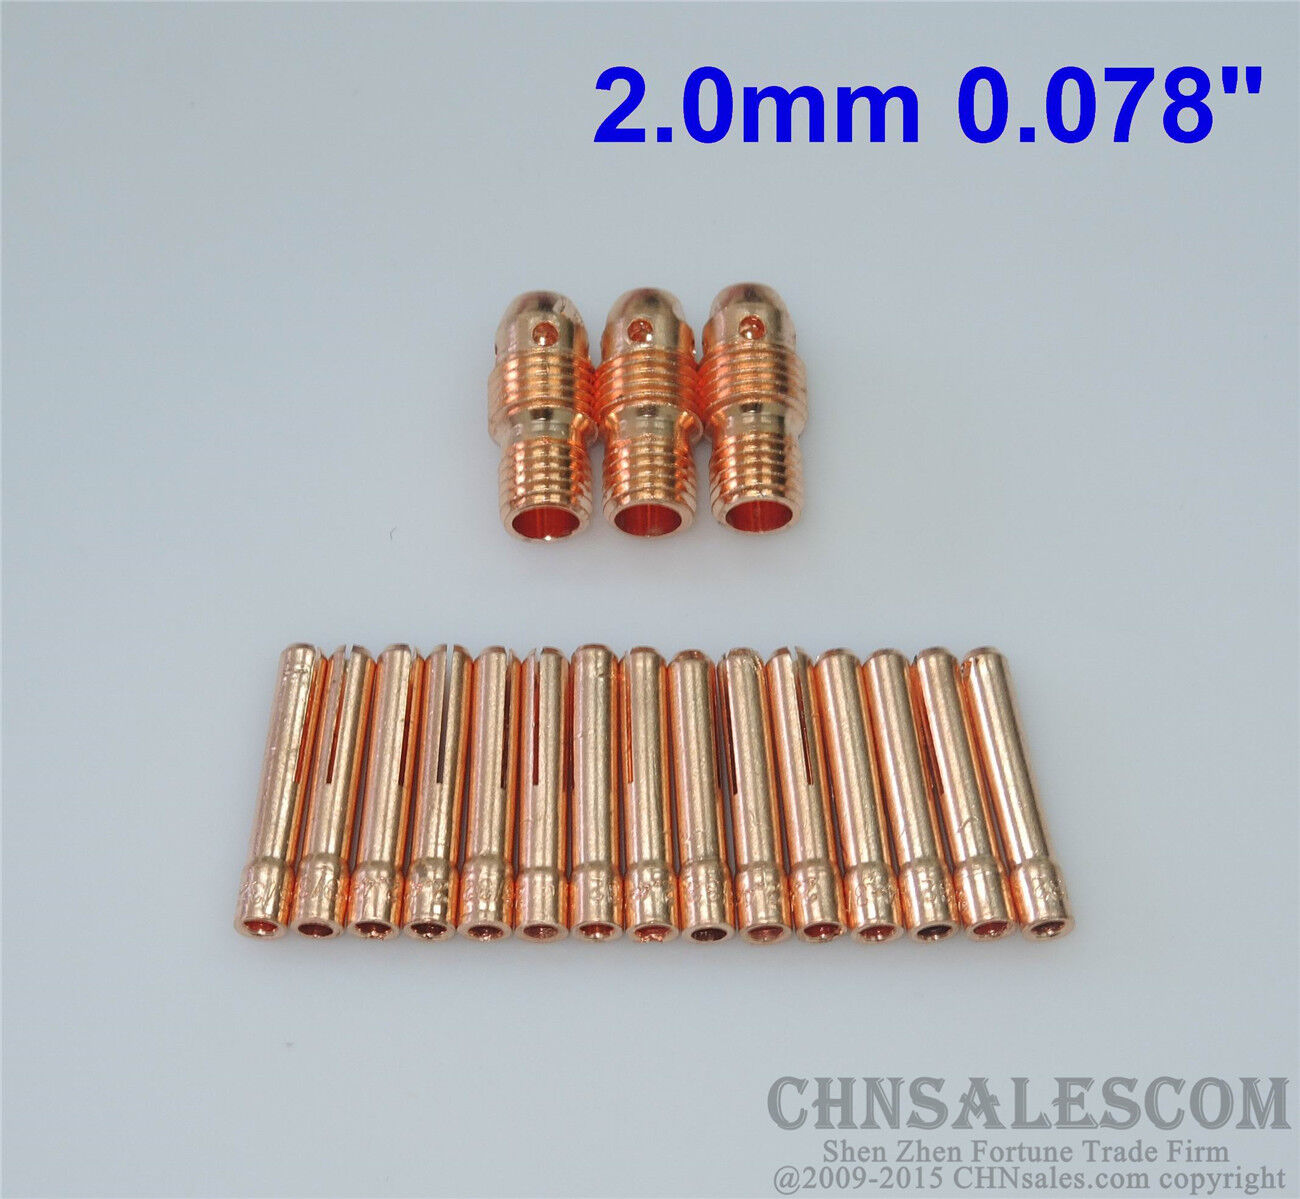 "20 pcs 13N27M Collet Body 13N23M Collet for Tig Welding WP-9//20//25 2.0mm 0.078/"""